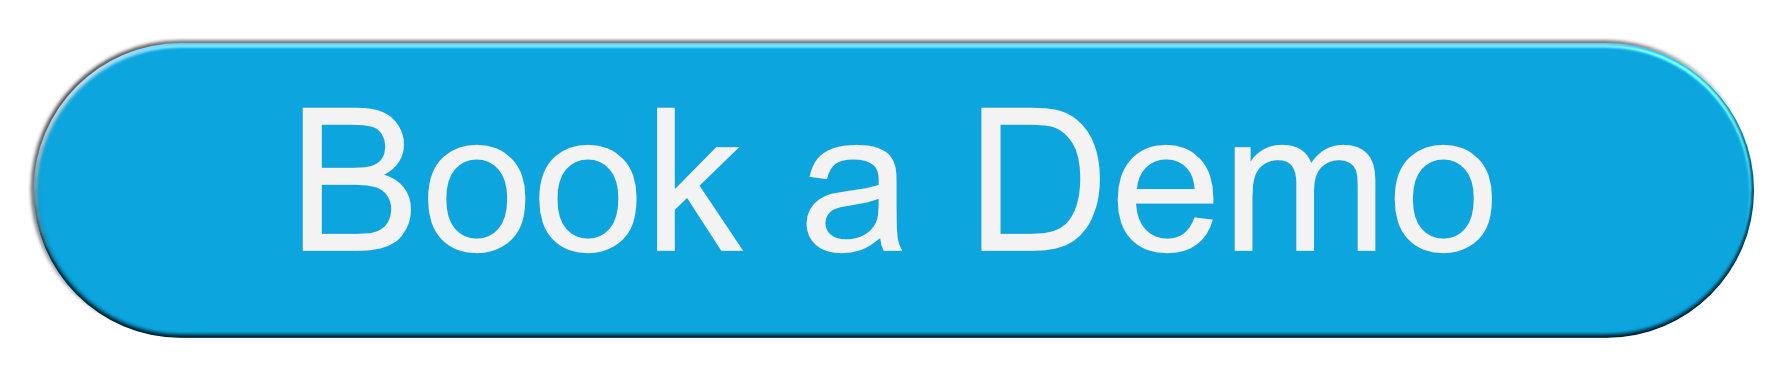 Book a Calrec Type R Demo - Button - Synthax Audio UK